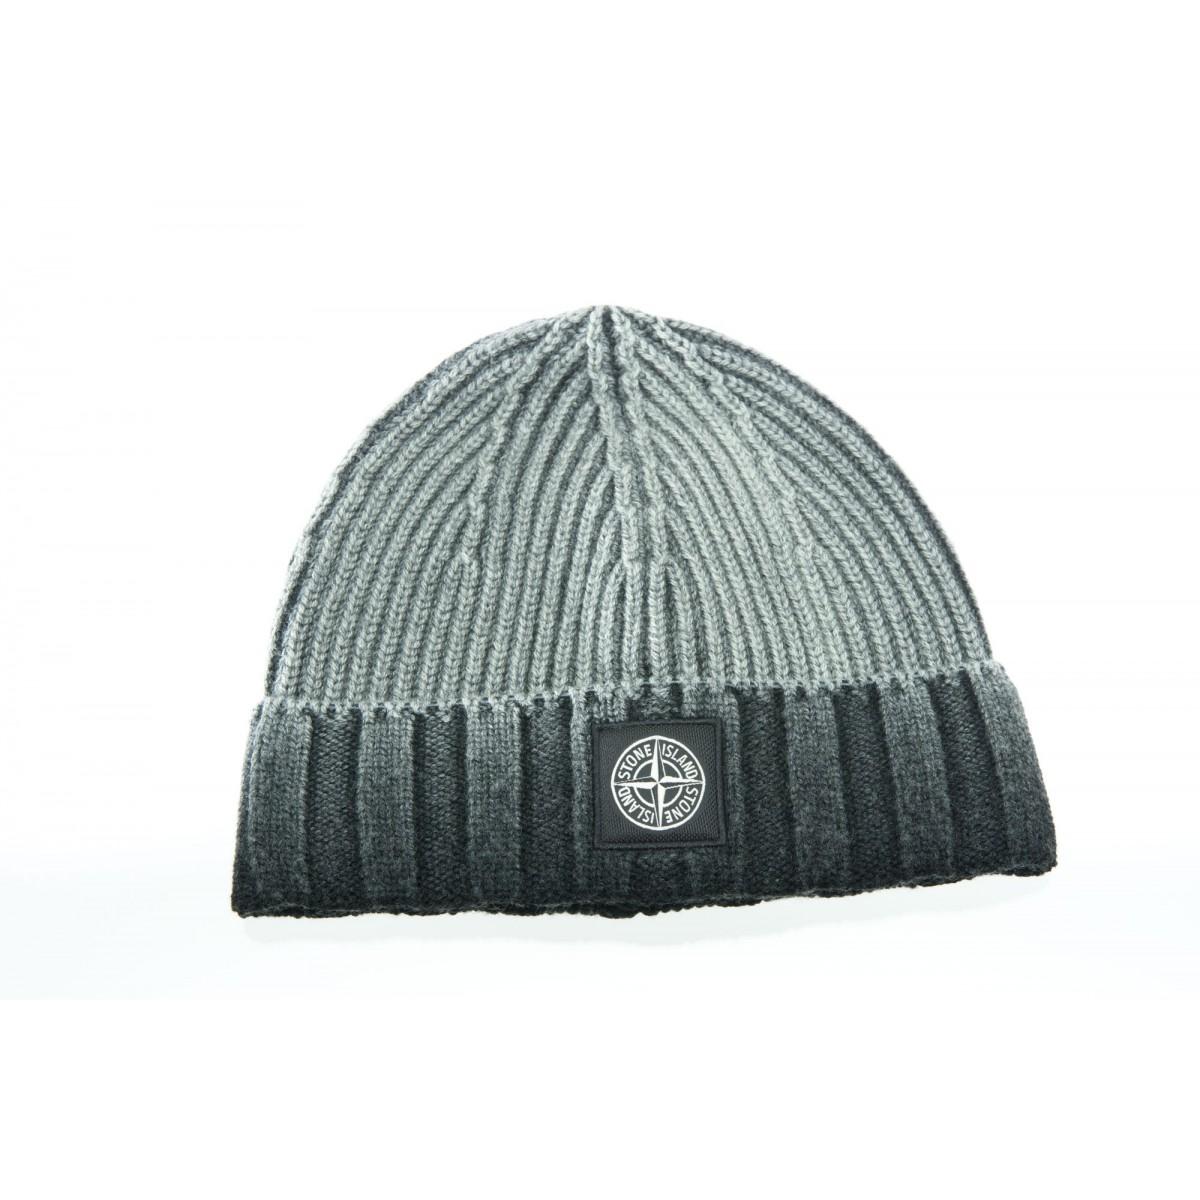 Berretto - N01b7 berreto lana frosted 100% lana